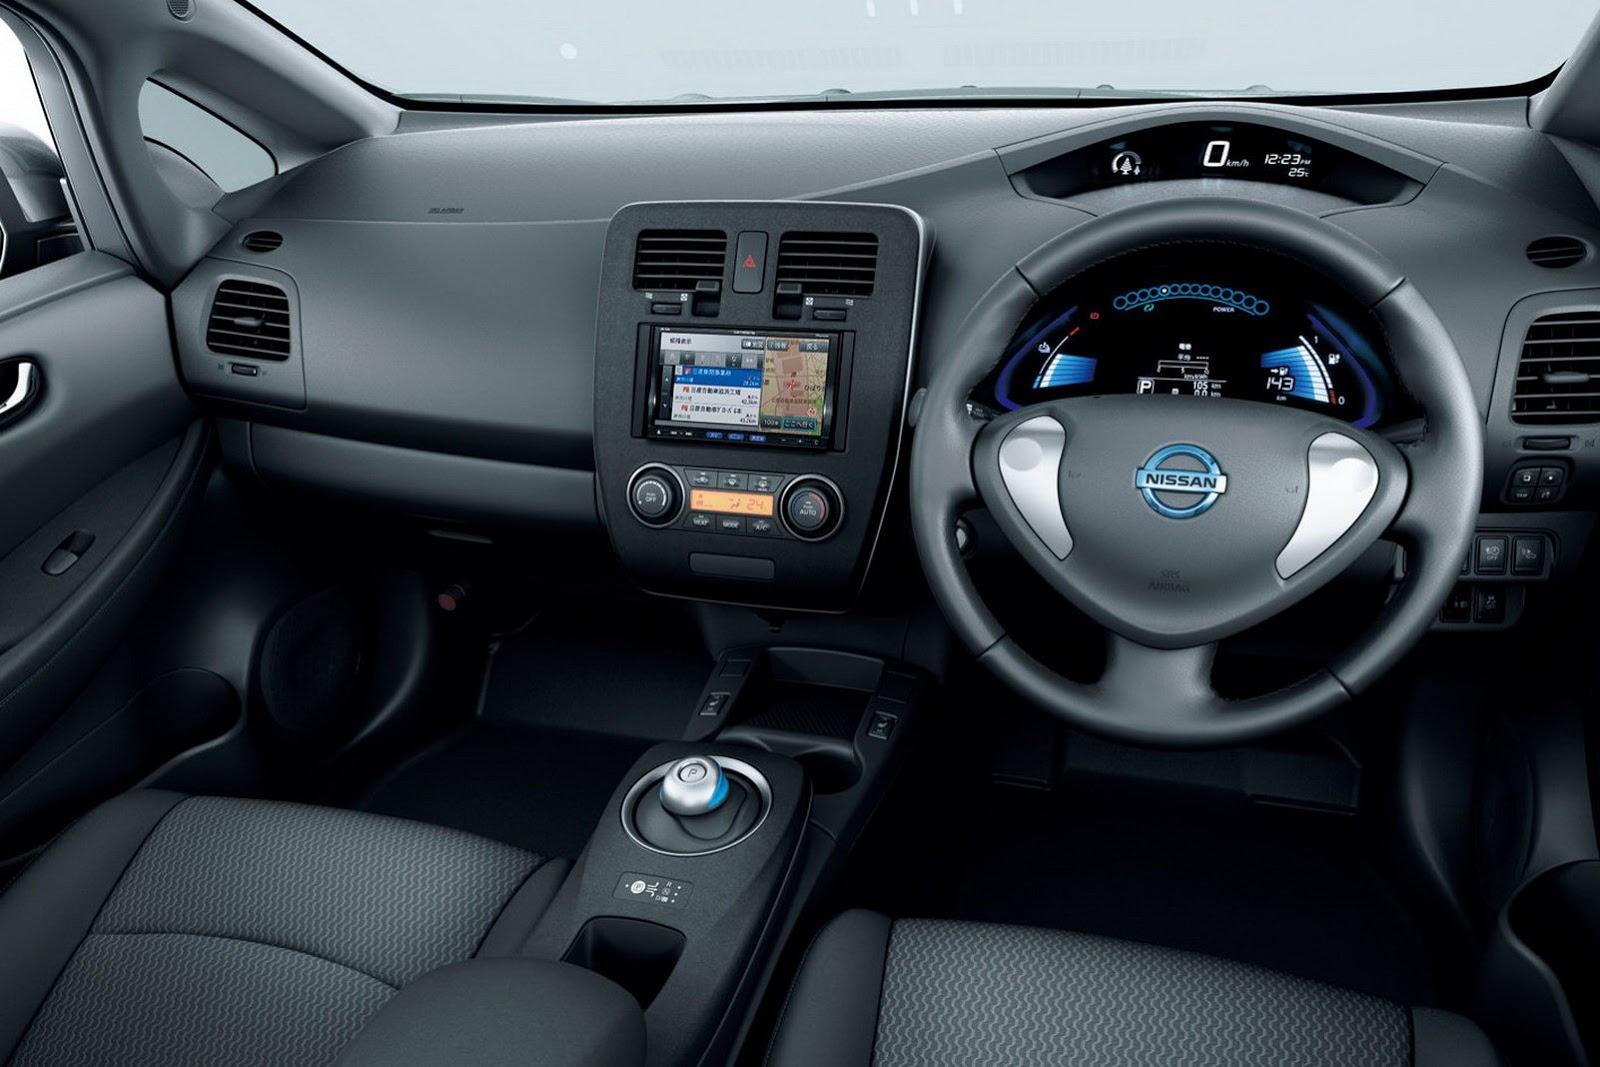 2013-Nissan-Leaf-34%25255B2%25255D.jpg